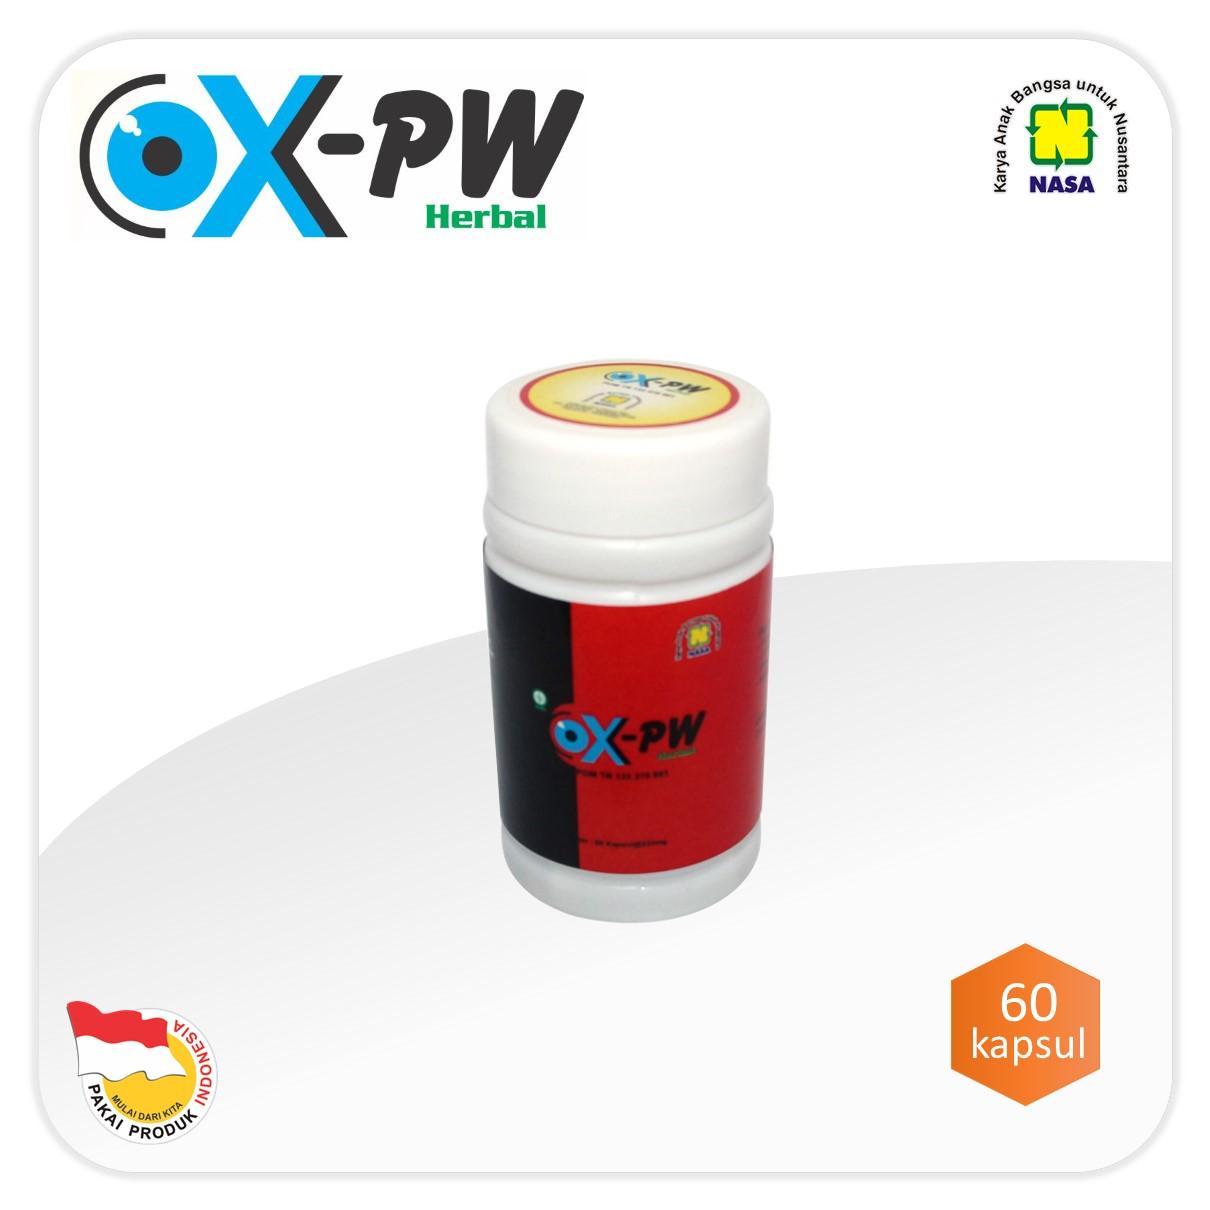 OX-PW NASA Herbal